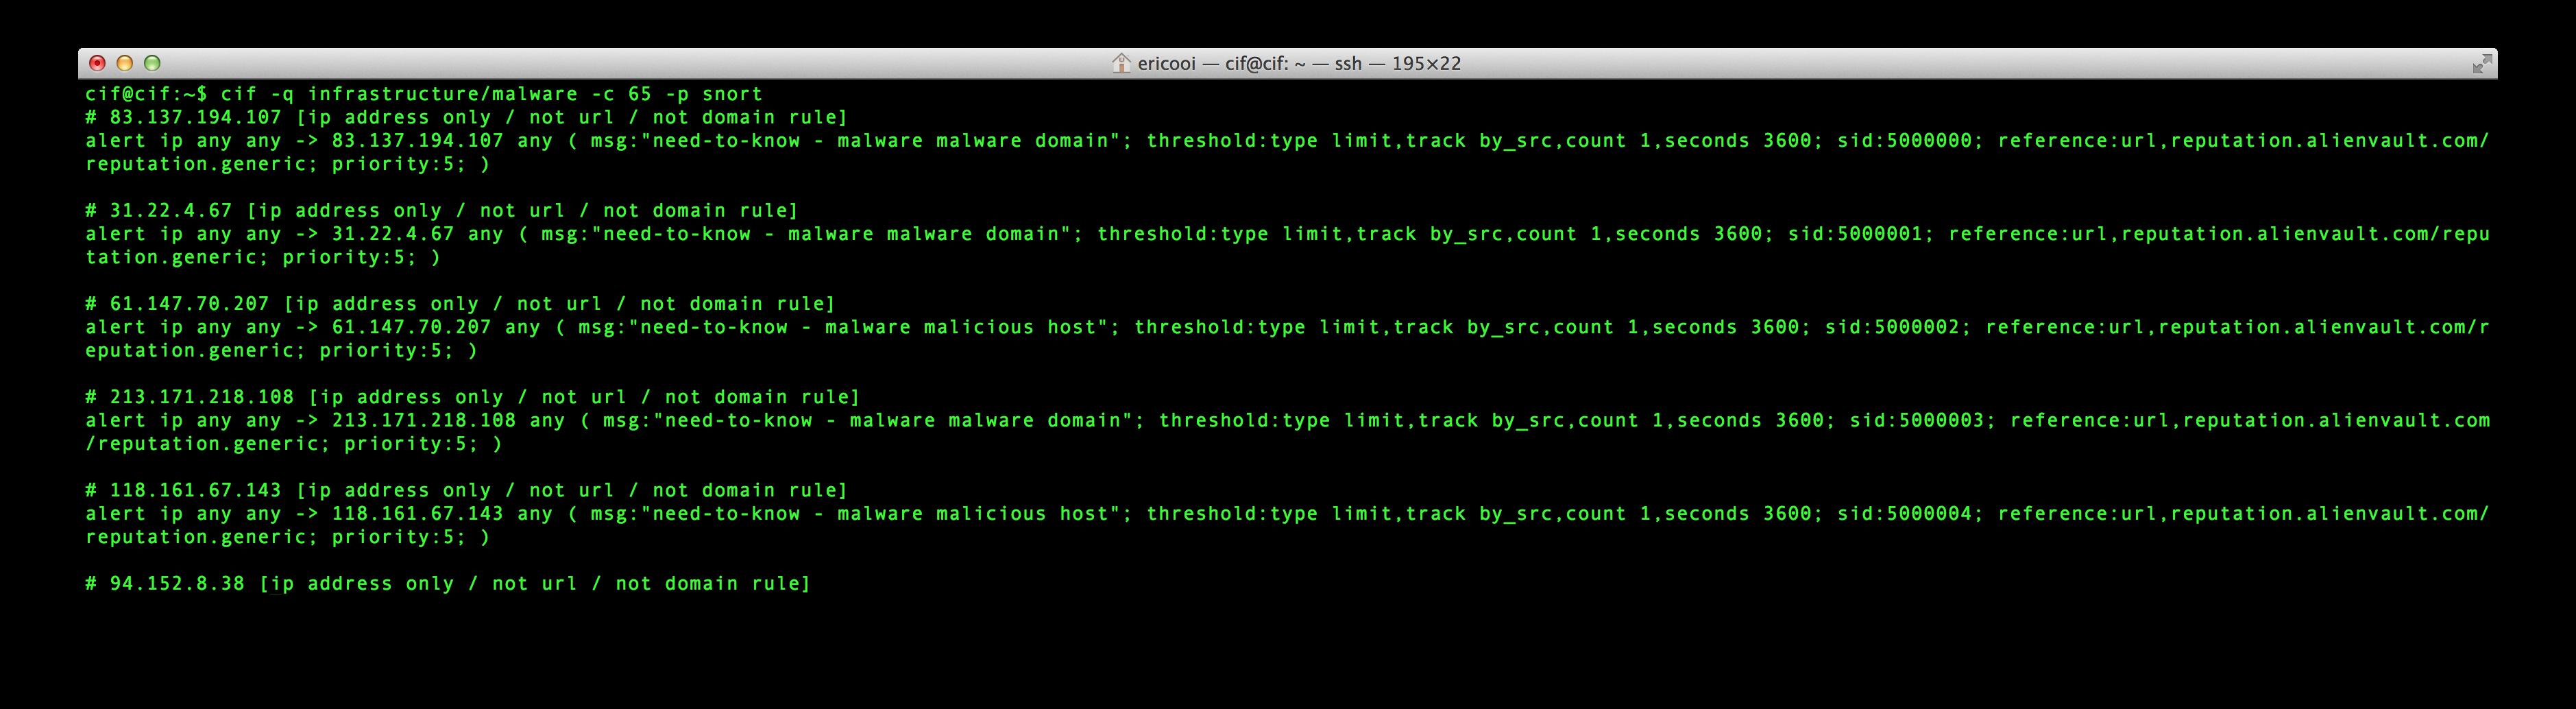 Malware IP Addresses (Snort): cif -q infrastructure/malware -c 65 -p snort